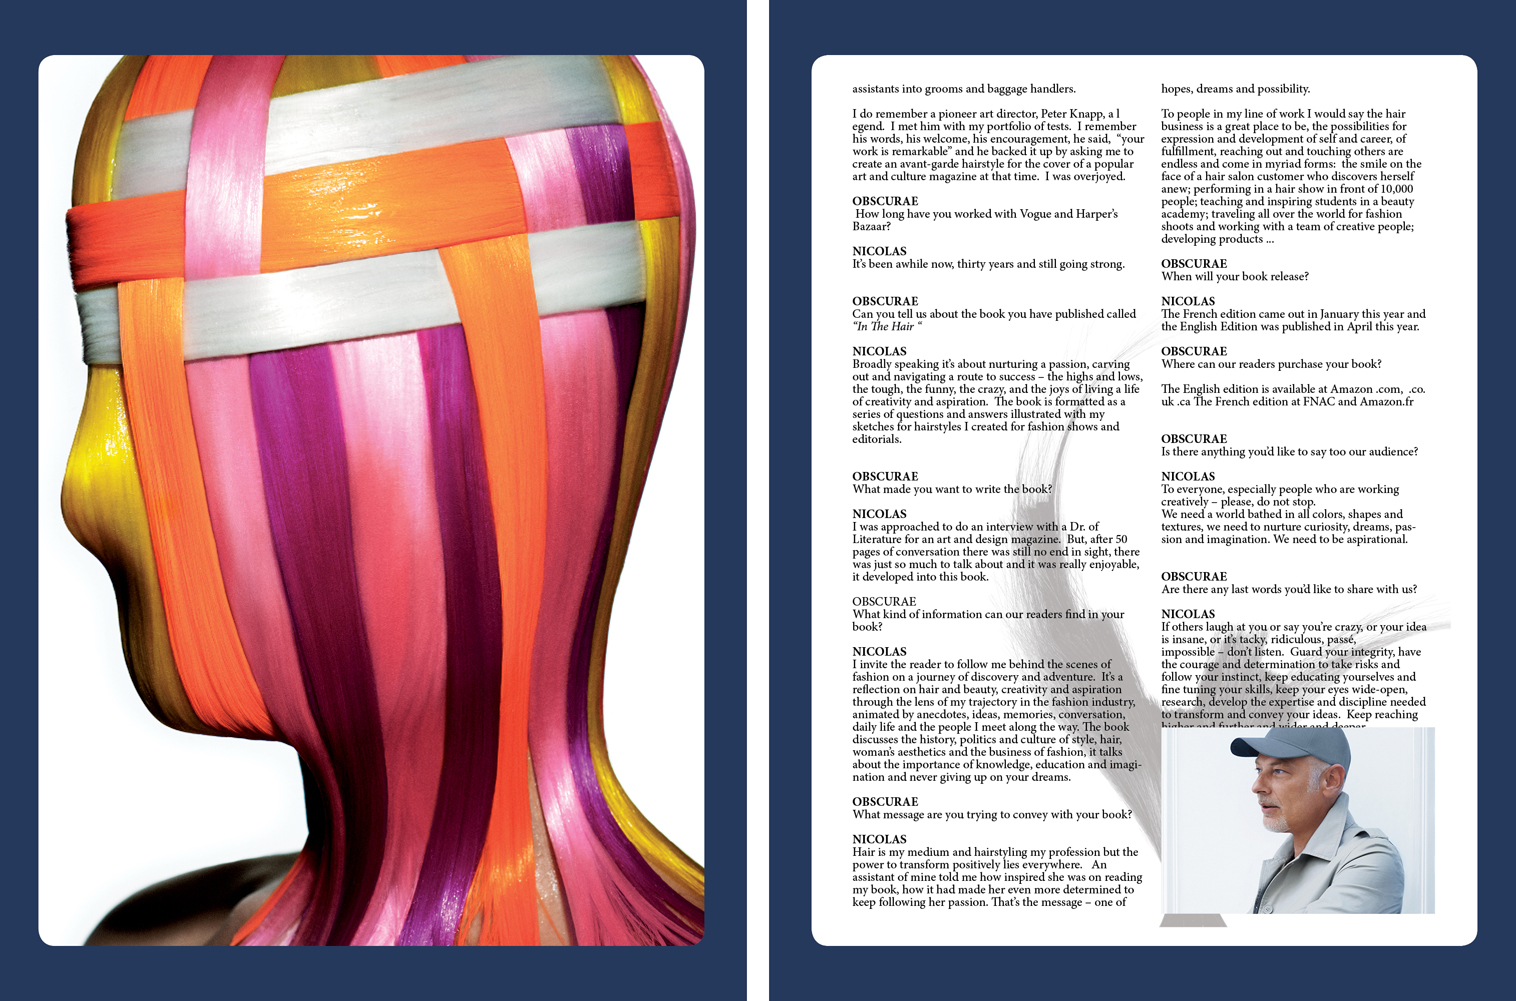 Obscurae Magazine - Nicolas Jurnjack Page 78-79